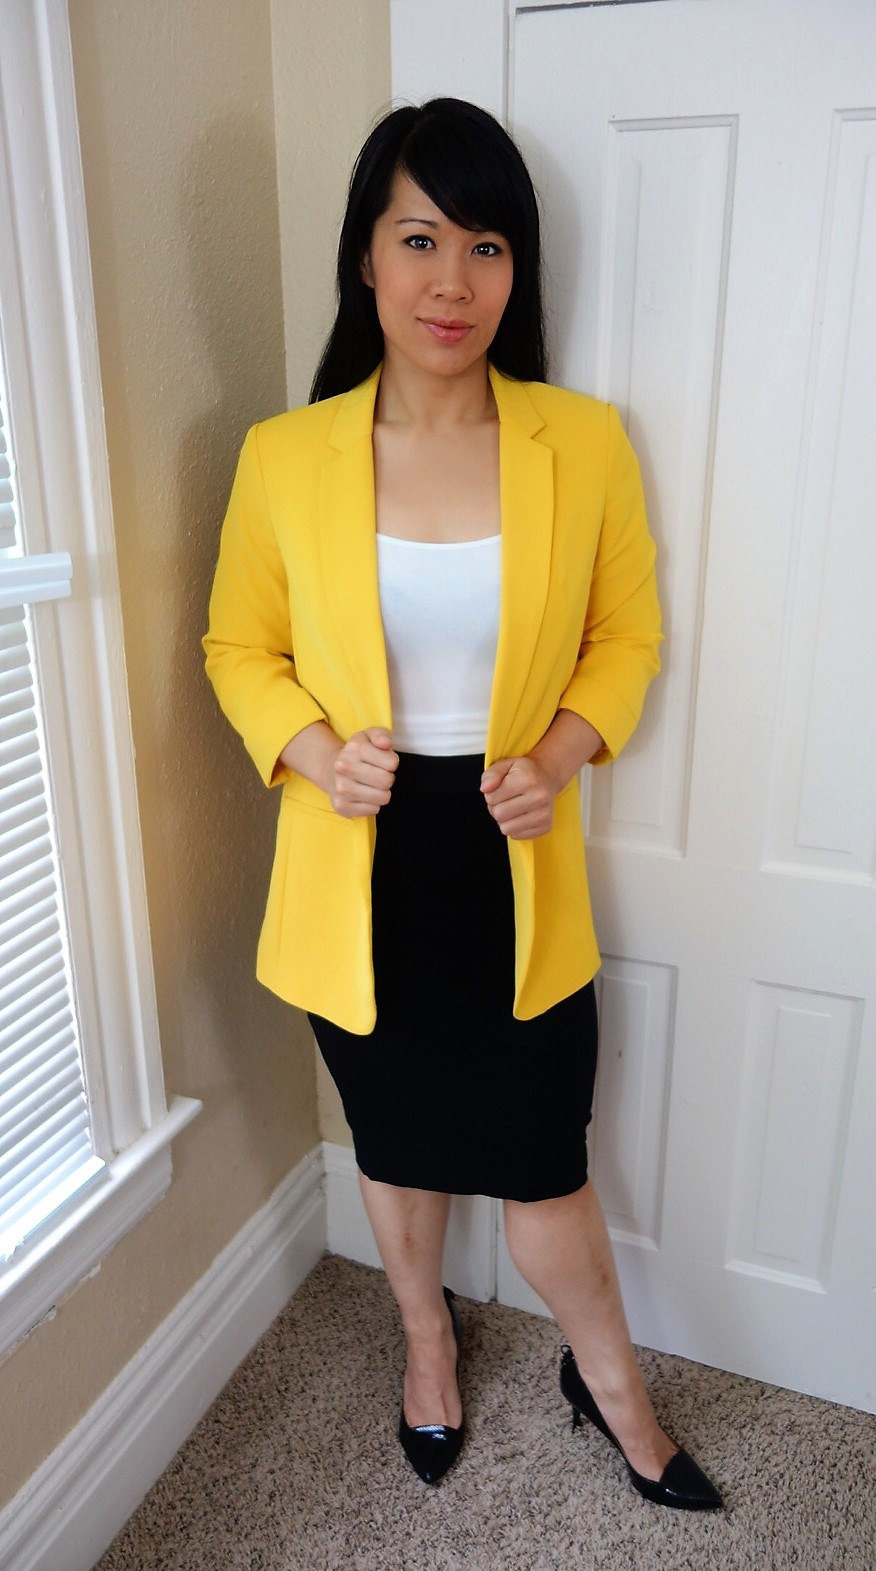 Kat wearing boyfriend blazer with pencil skirt